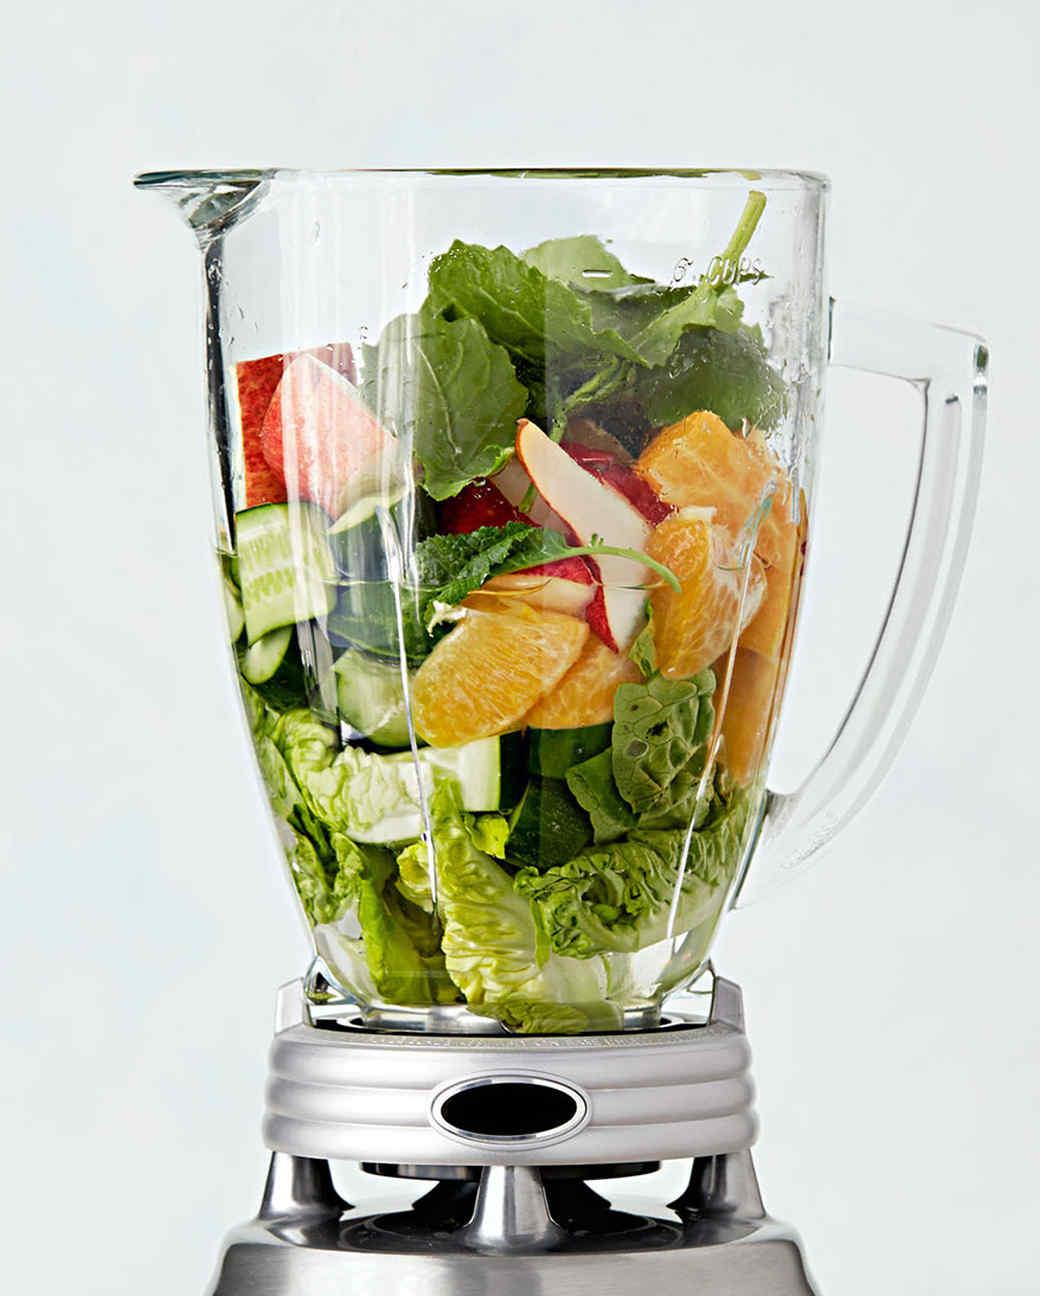 fruit vegetables blender